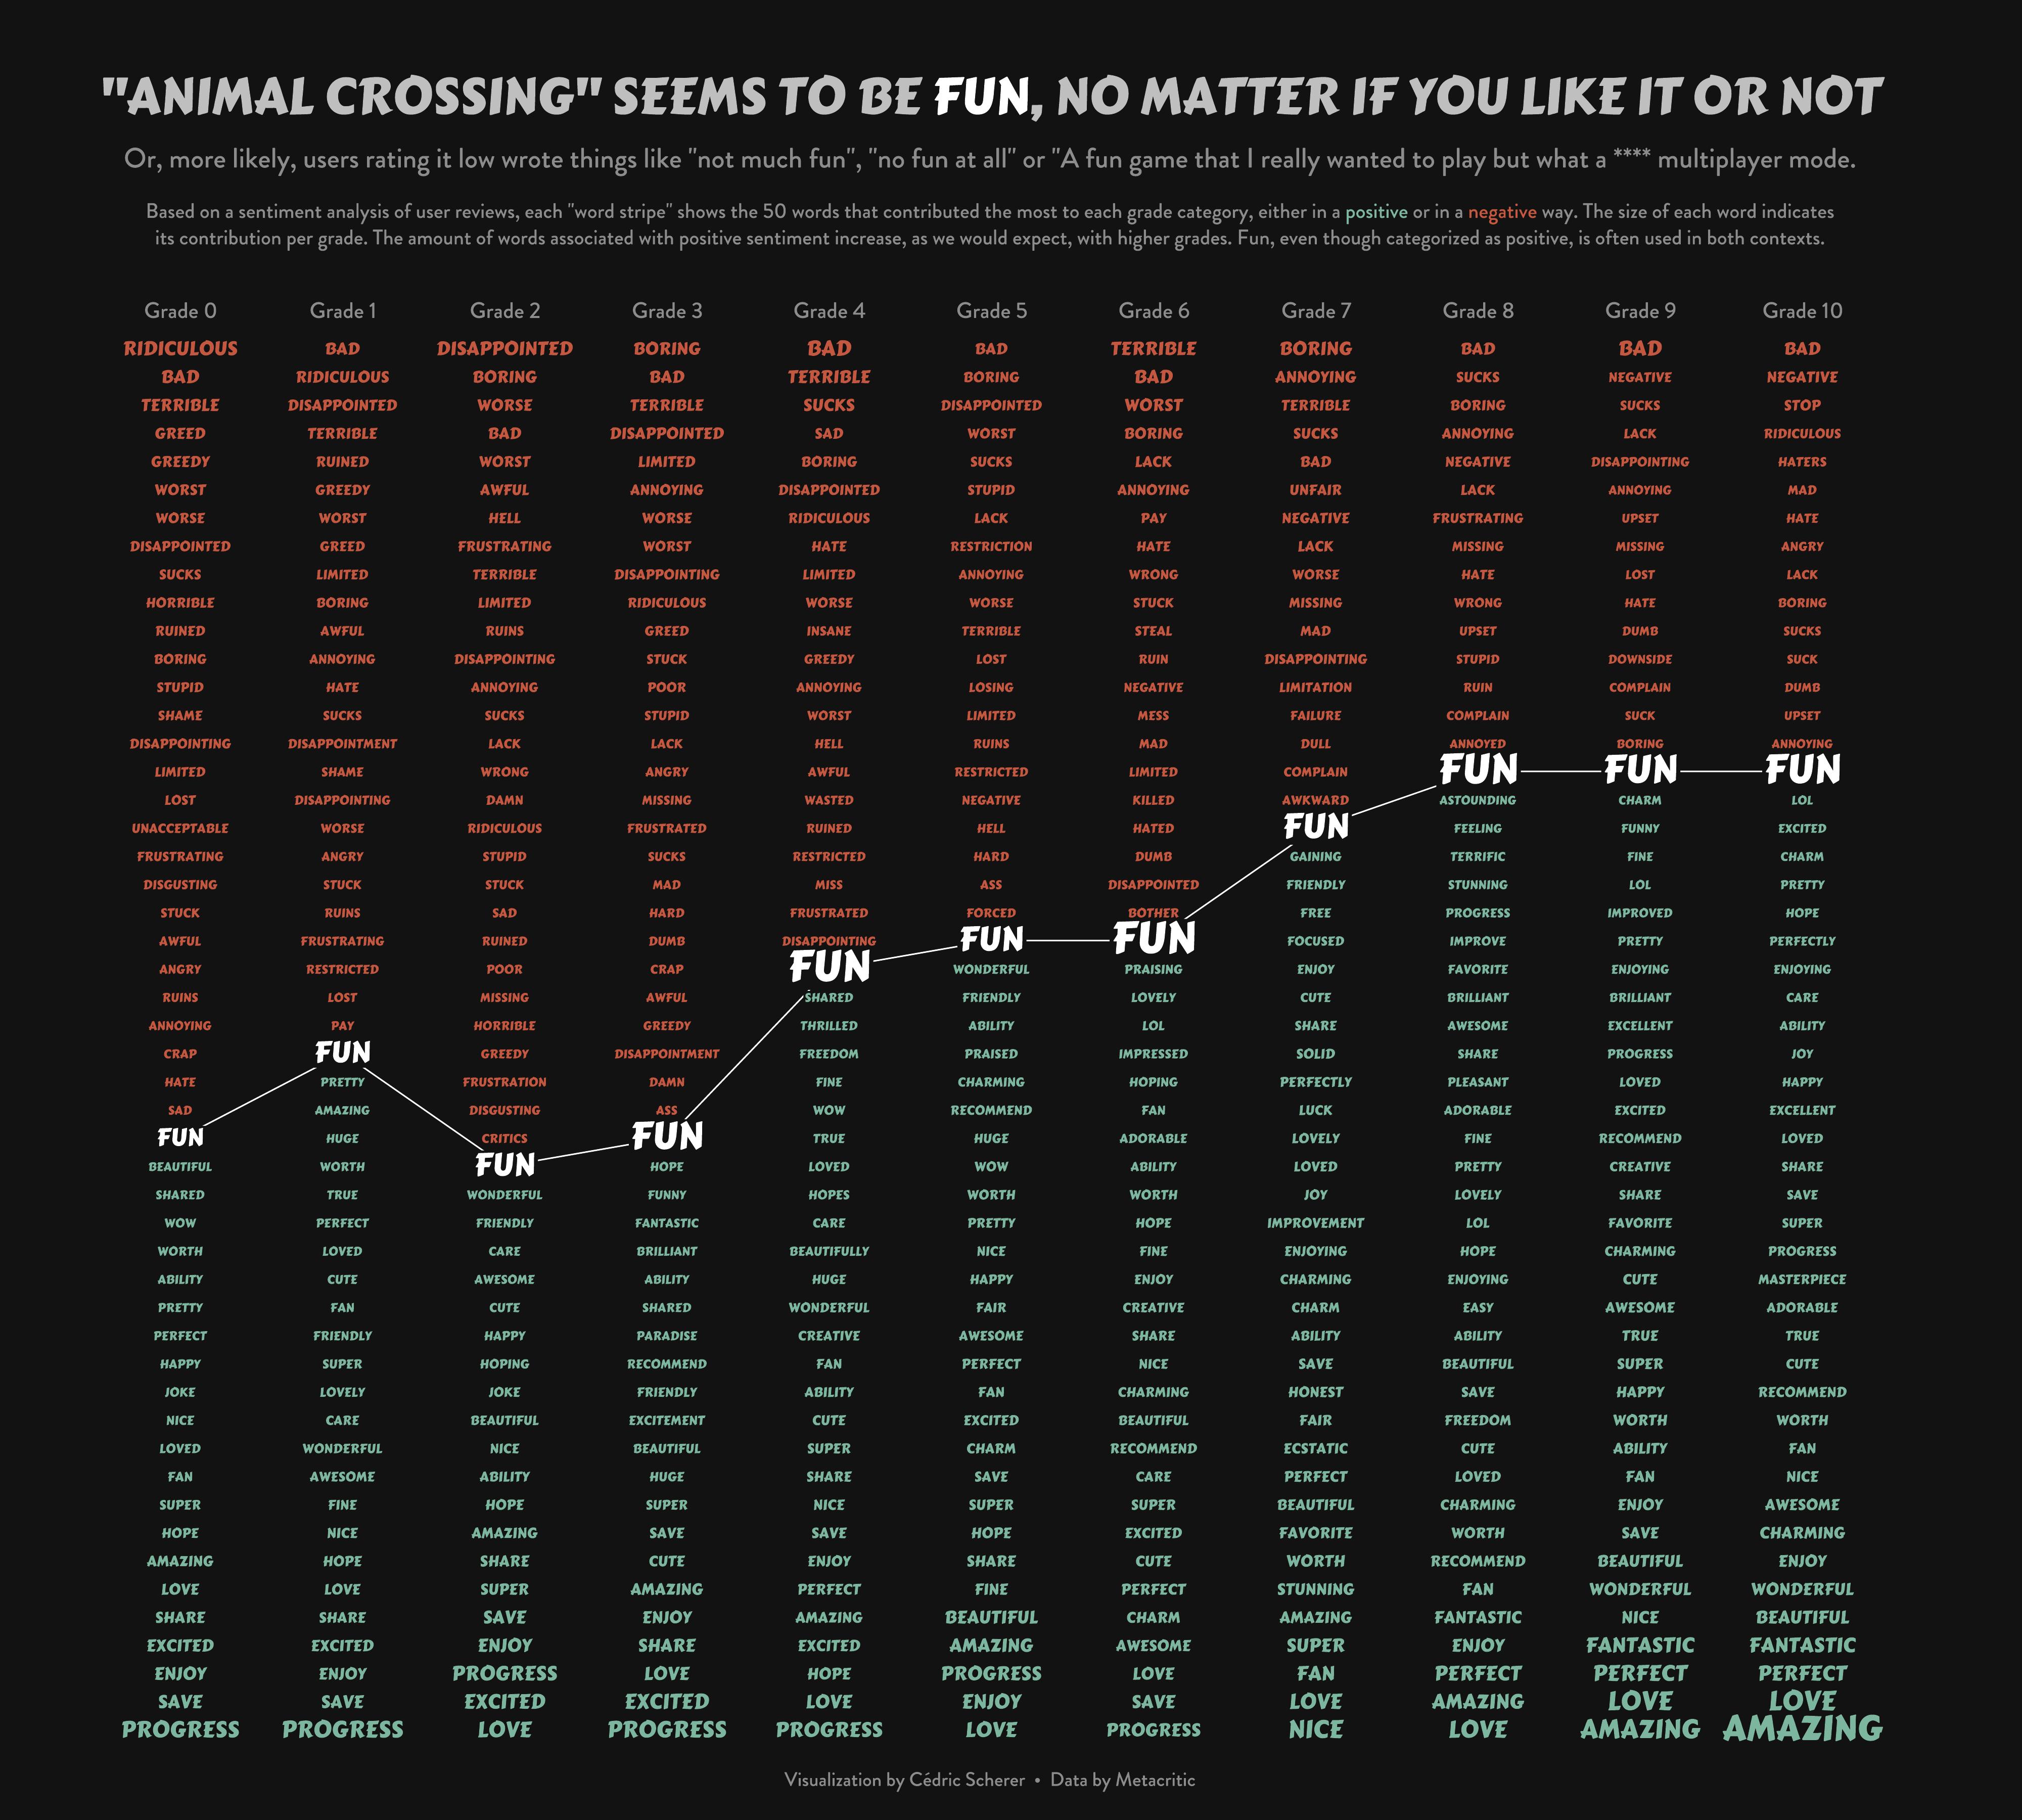 ./plots/2020_19/2020_19_AnimalCrossing_alt_50.png